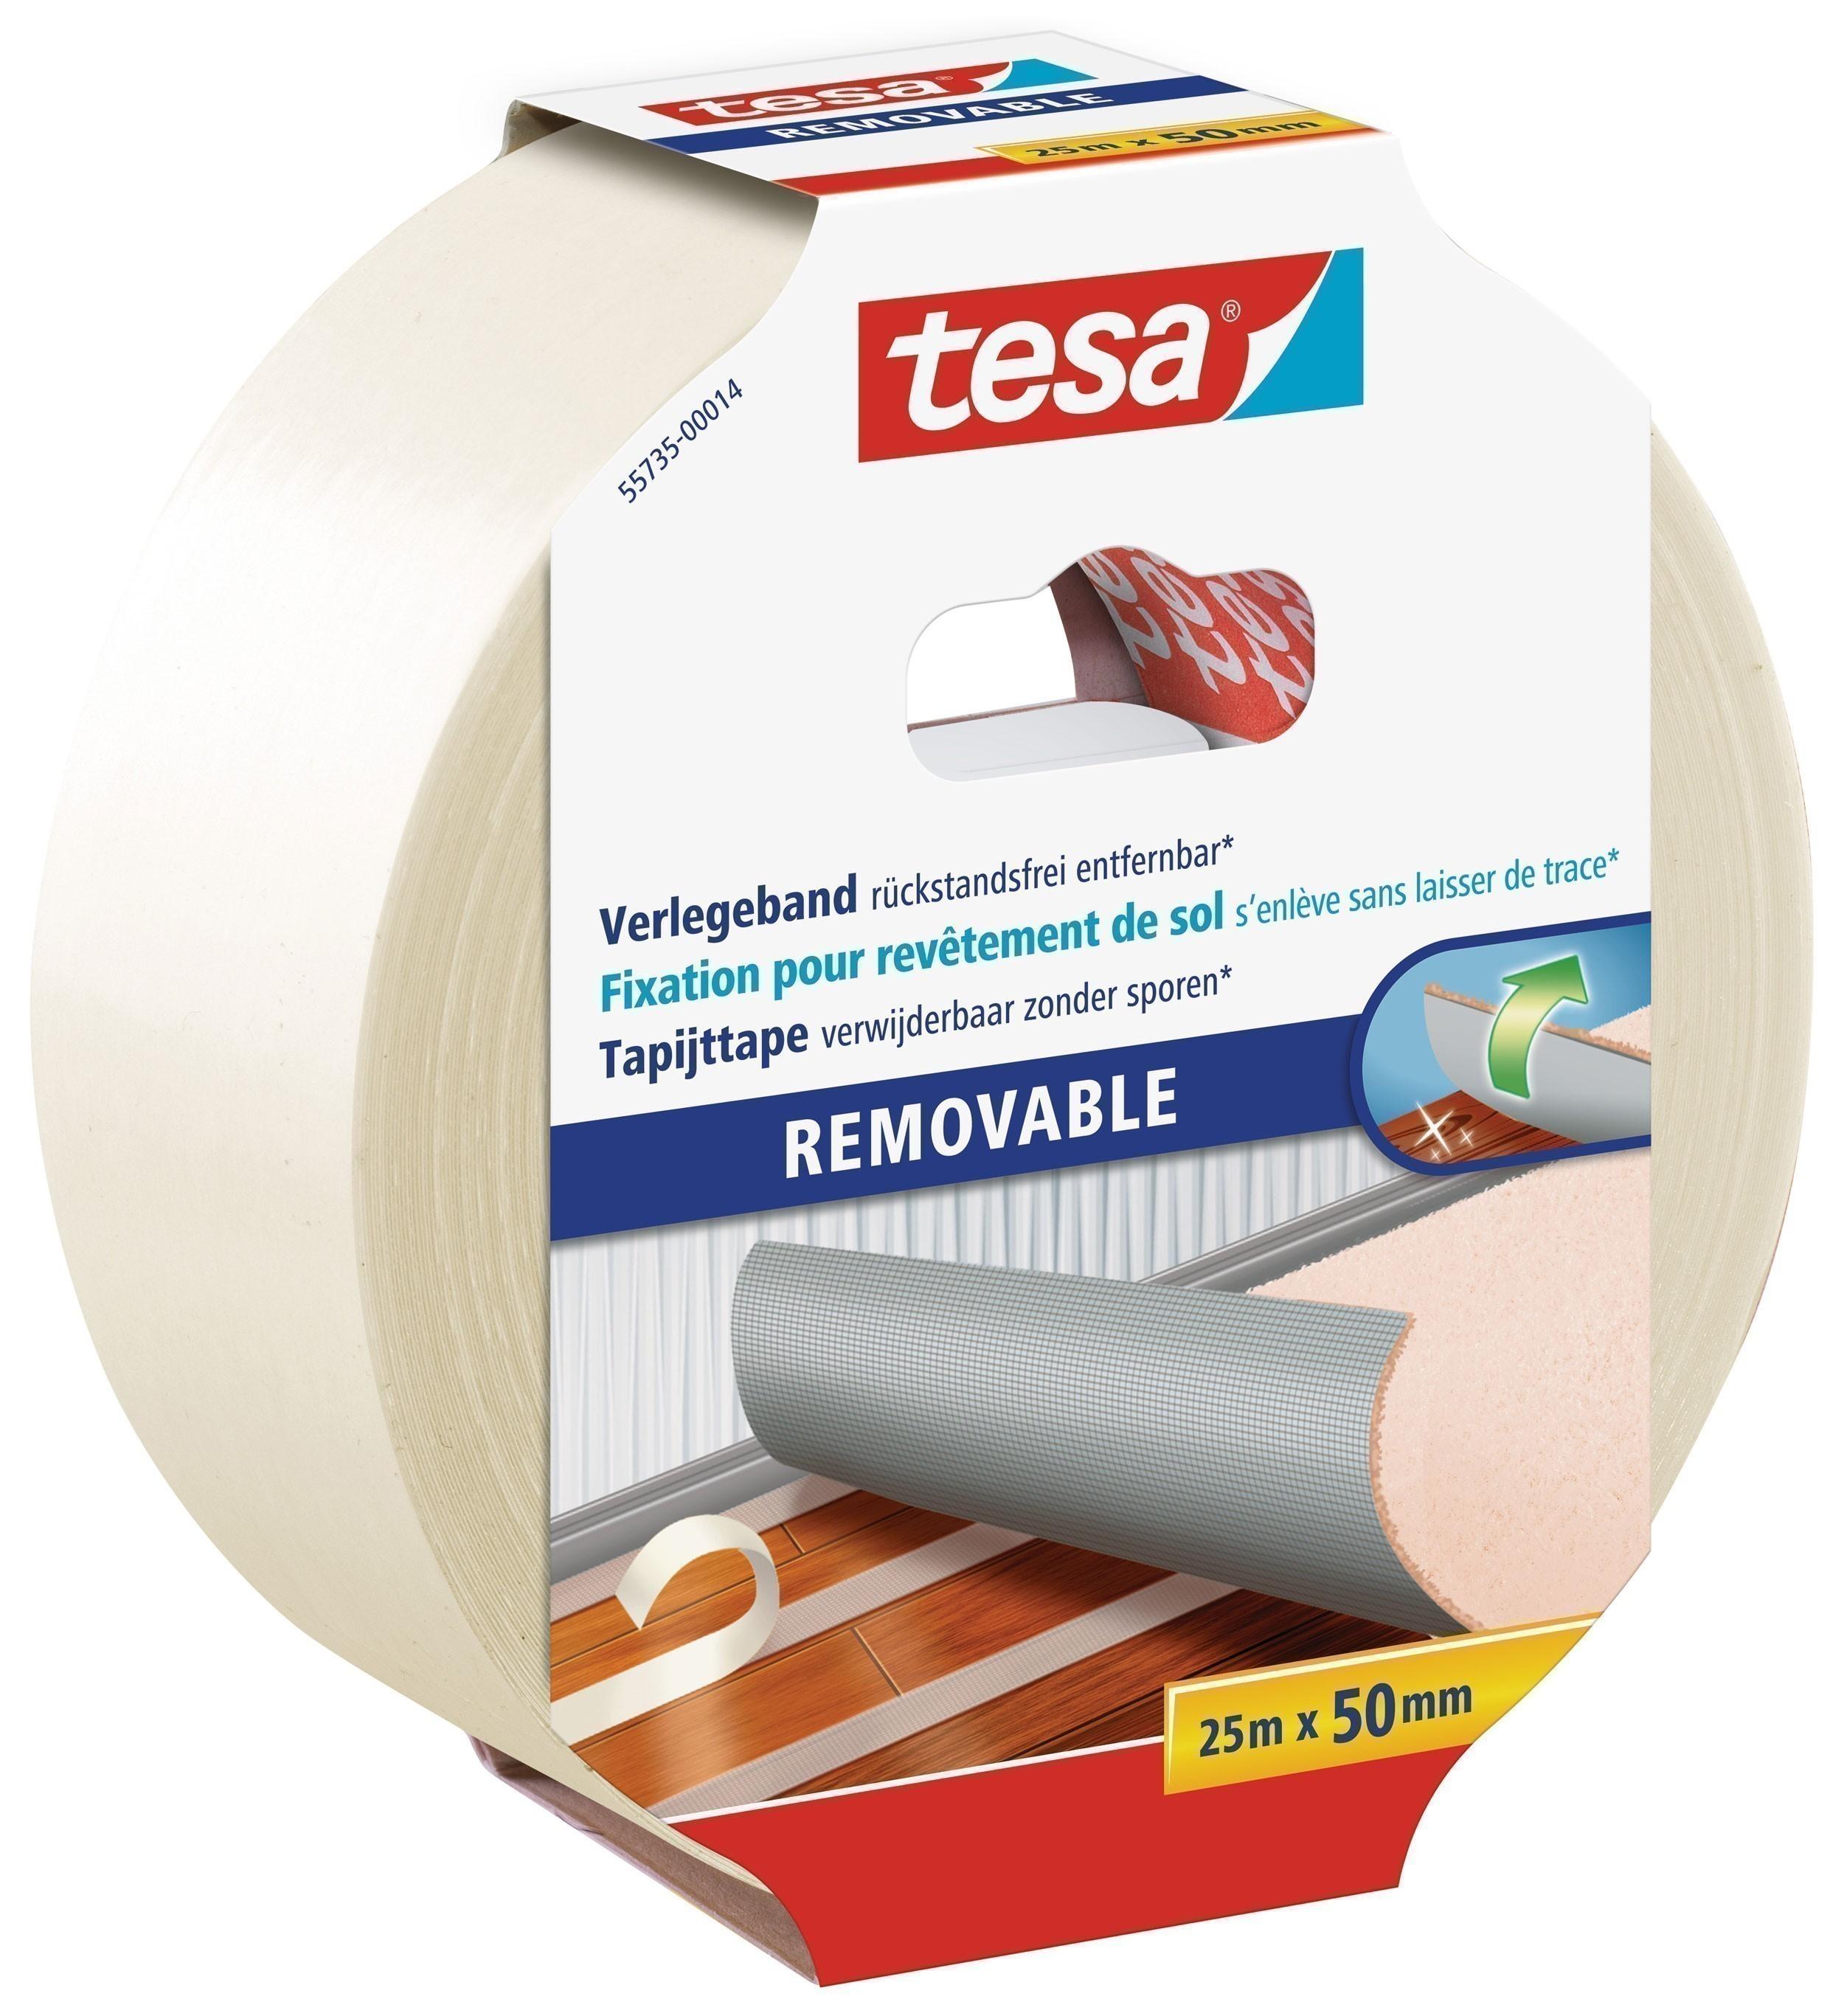 tesa Verlegeband REMOVABLE doppelseitiges Klebeband 25m:50mm Bild 1